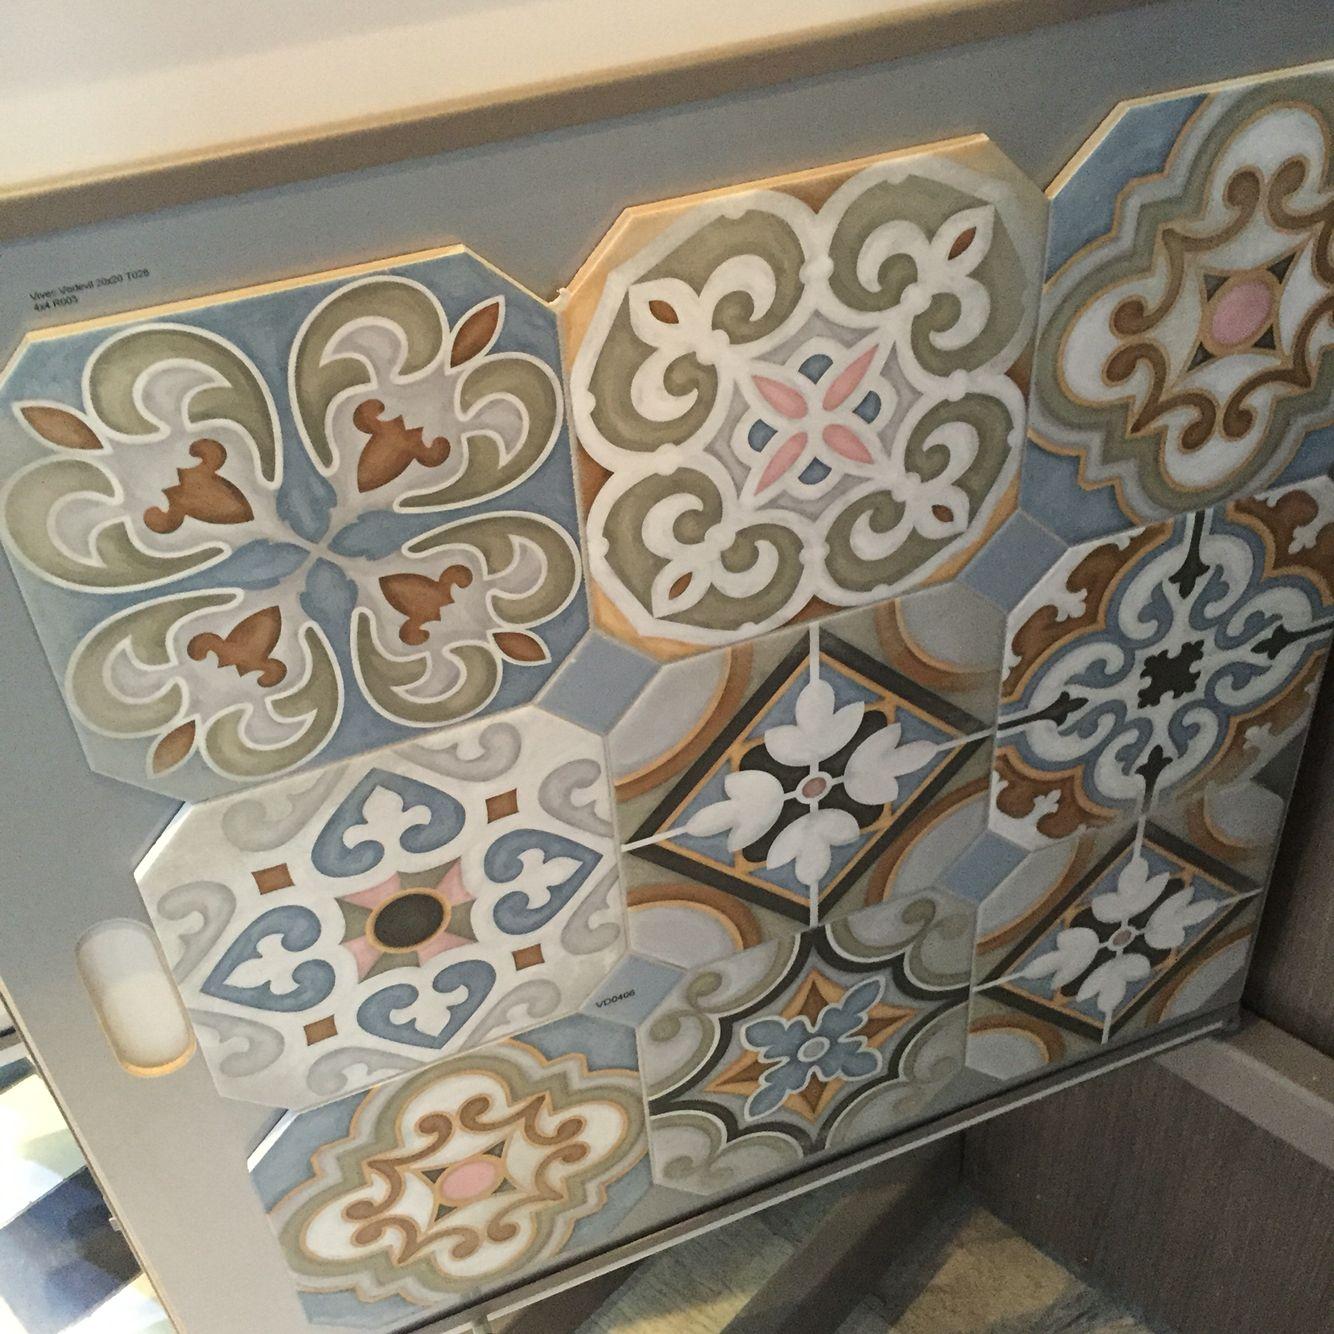 Keope cementine color vintage vloertegels in de keuken 30x30 cm ...